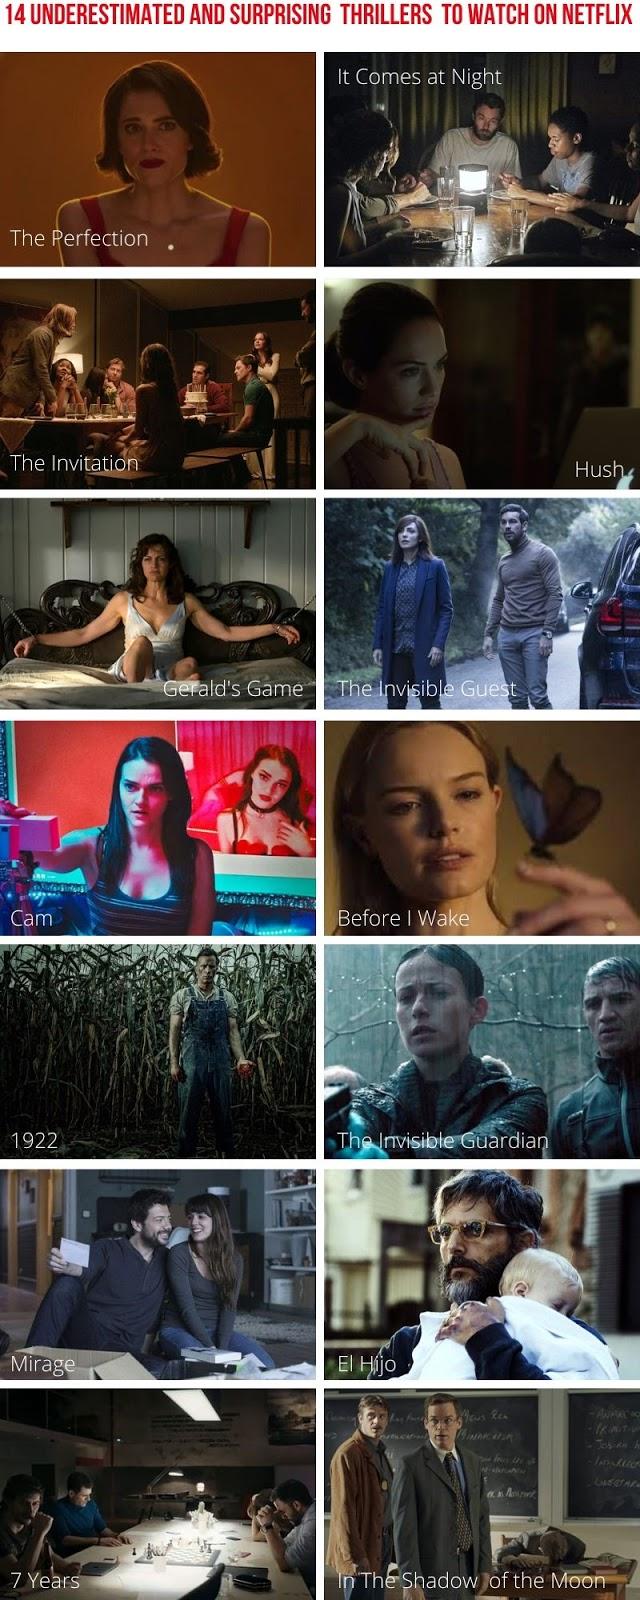 14 Thrillers Surpreendentes Mas Pouco Conhecidos Para Ver na Netflix